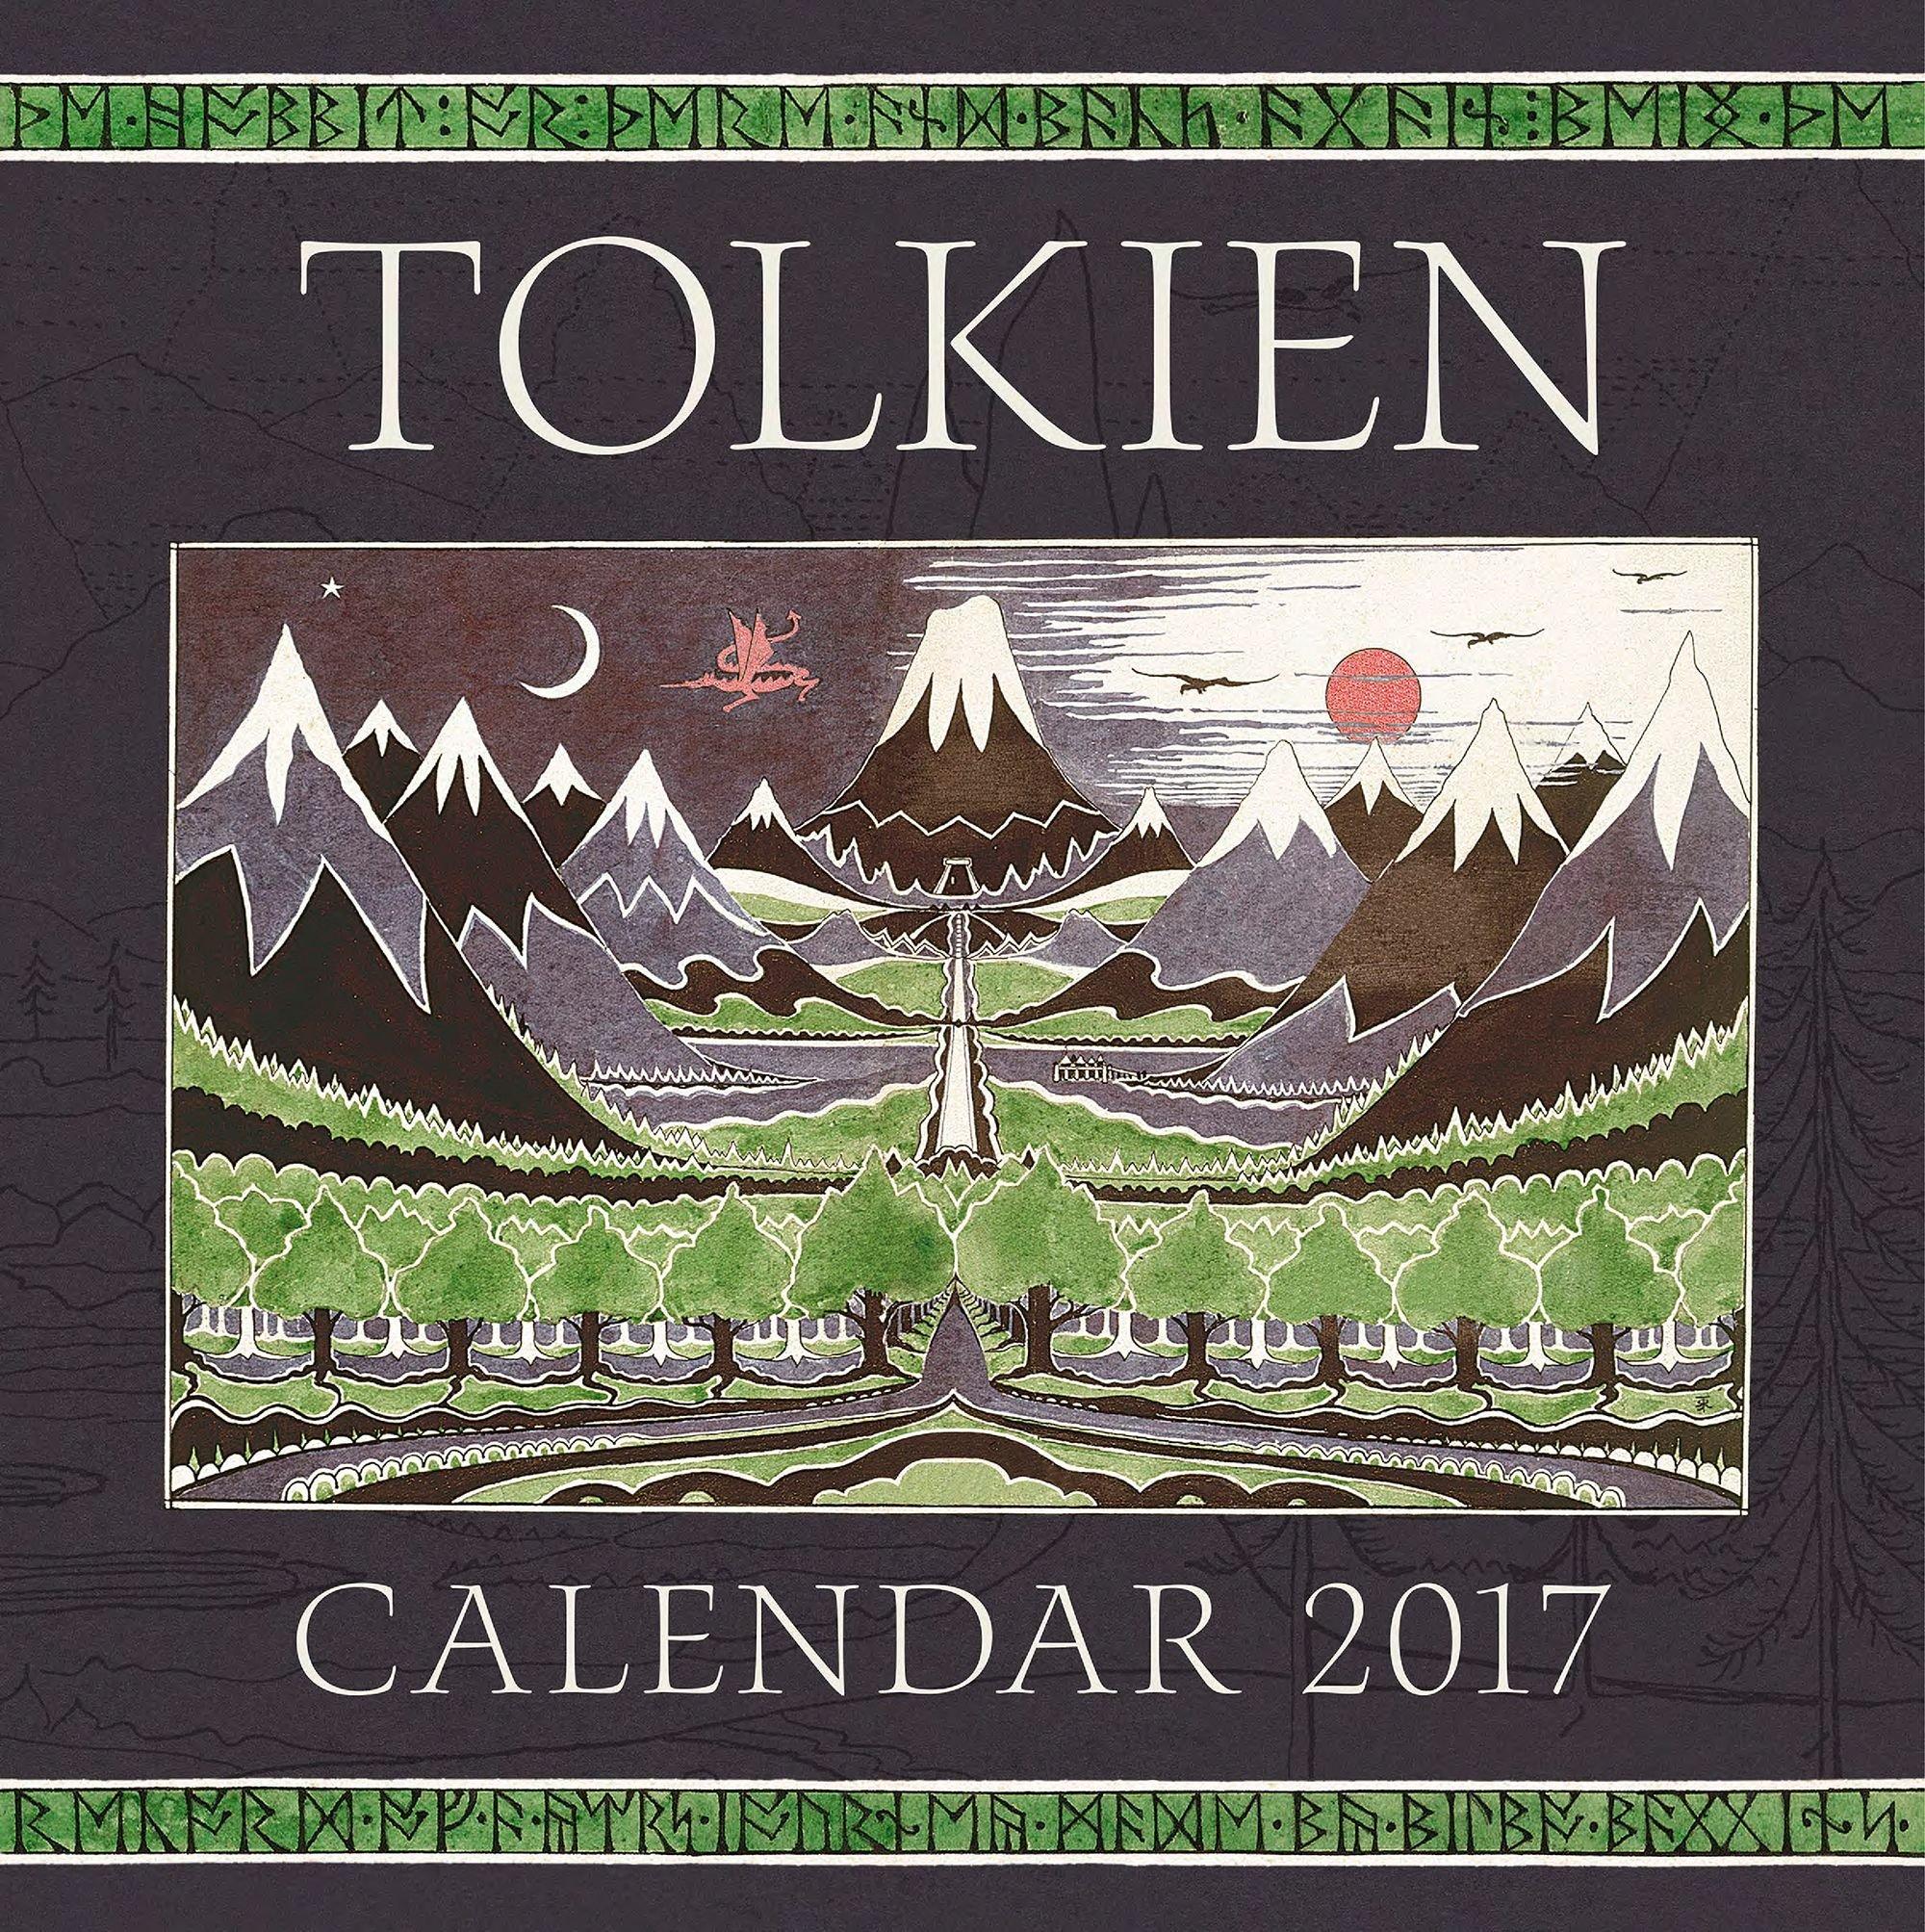 Calendario Tolkien 2017 (Biblioteca J. R. R. Tolkien ...